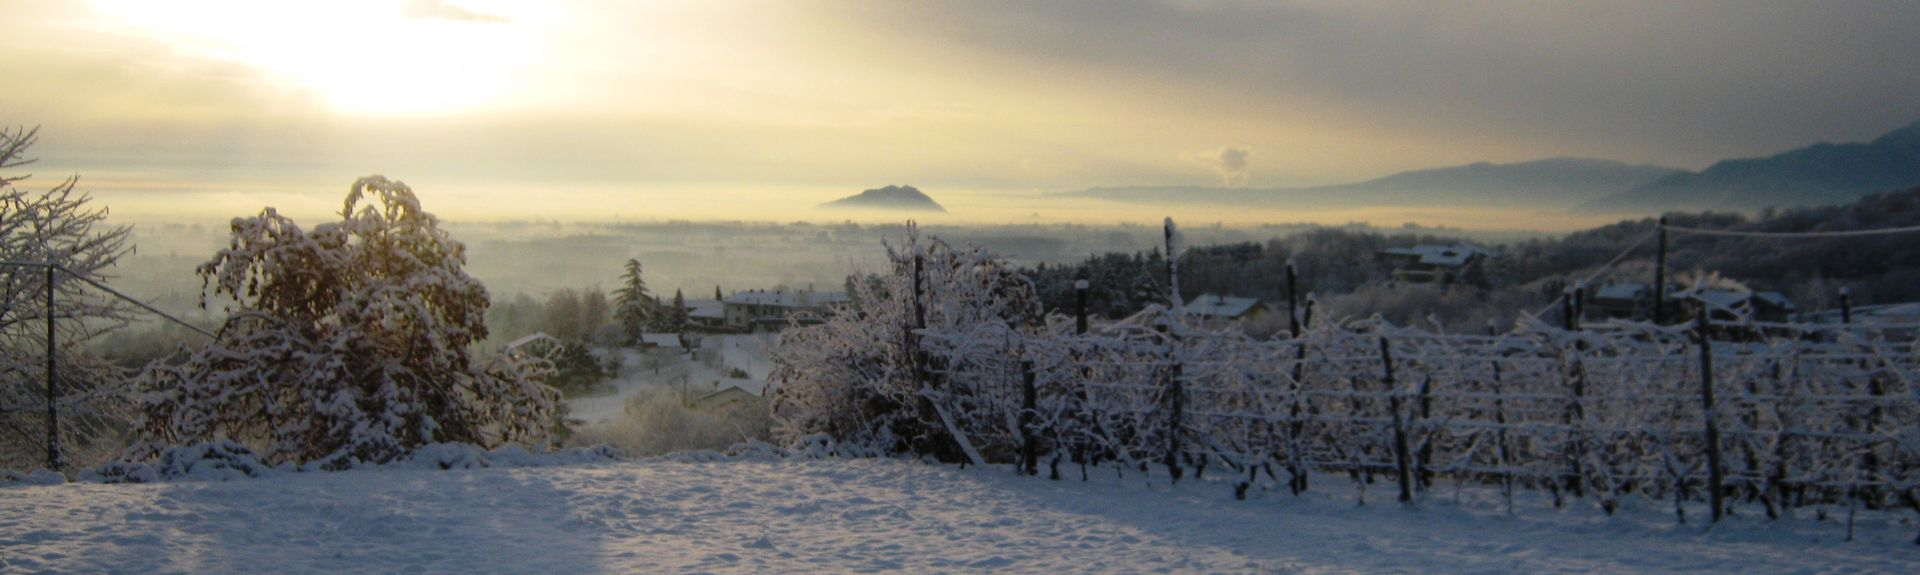 San Secondo di Pinerolo, Piedmont, Italië